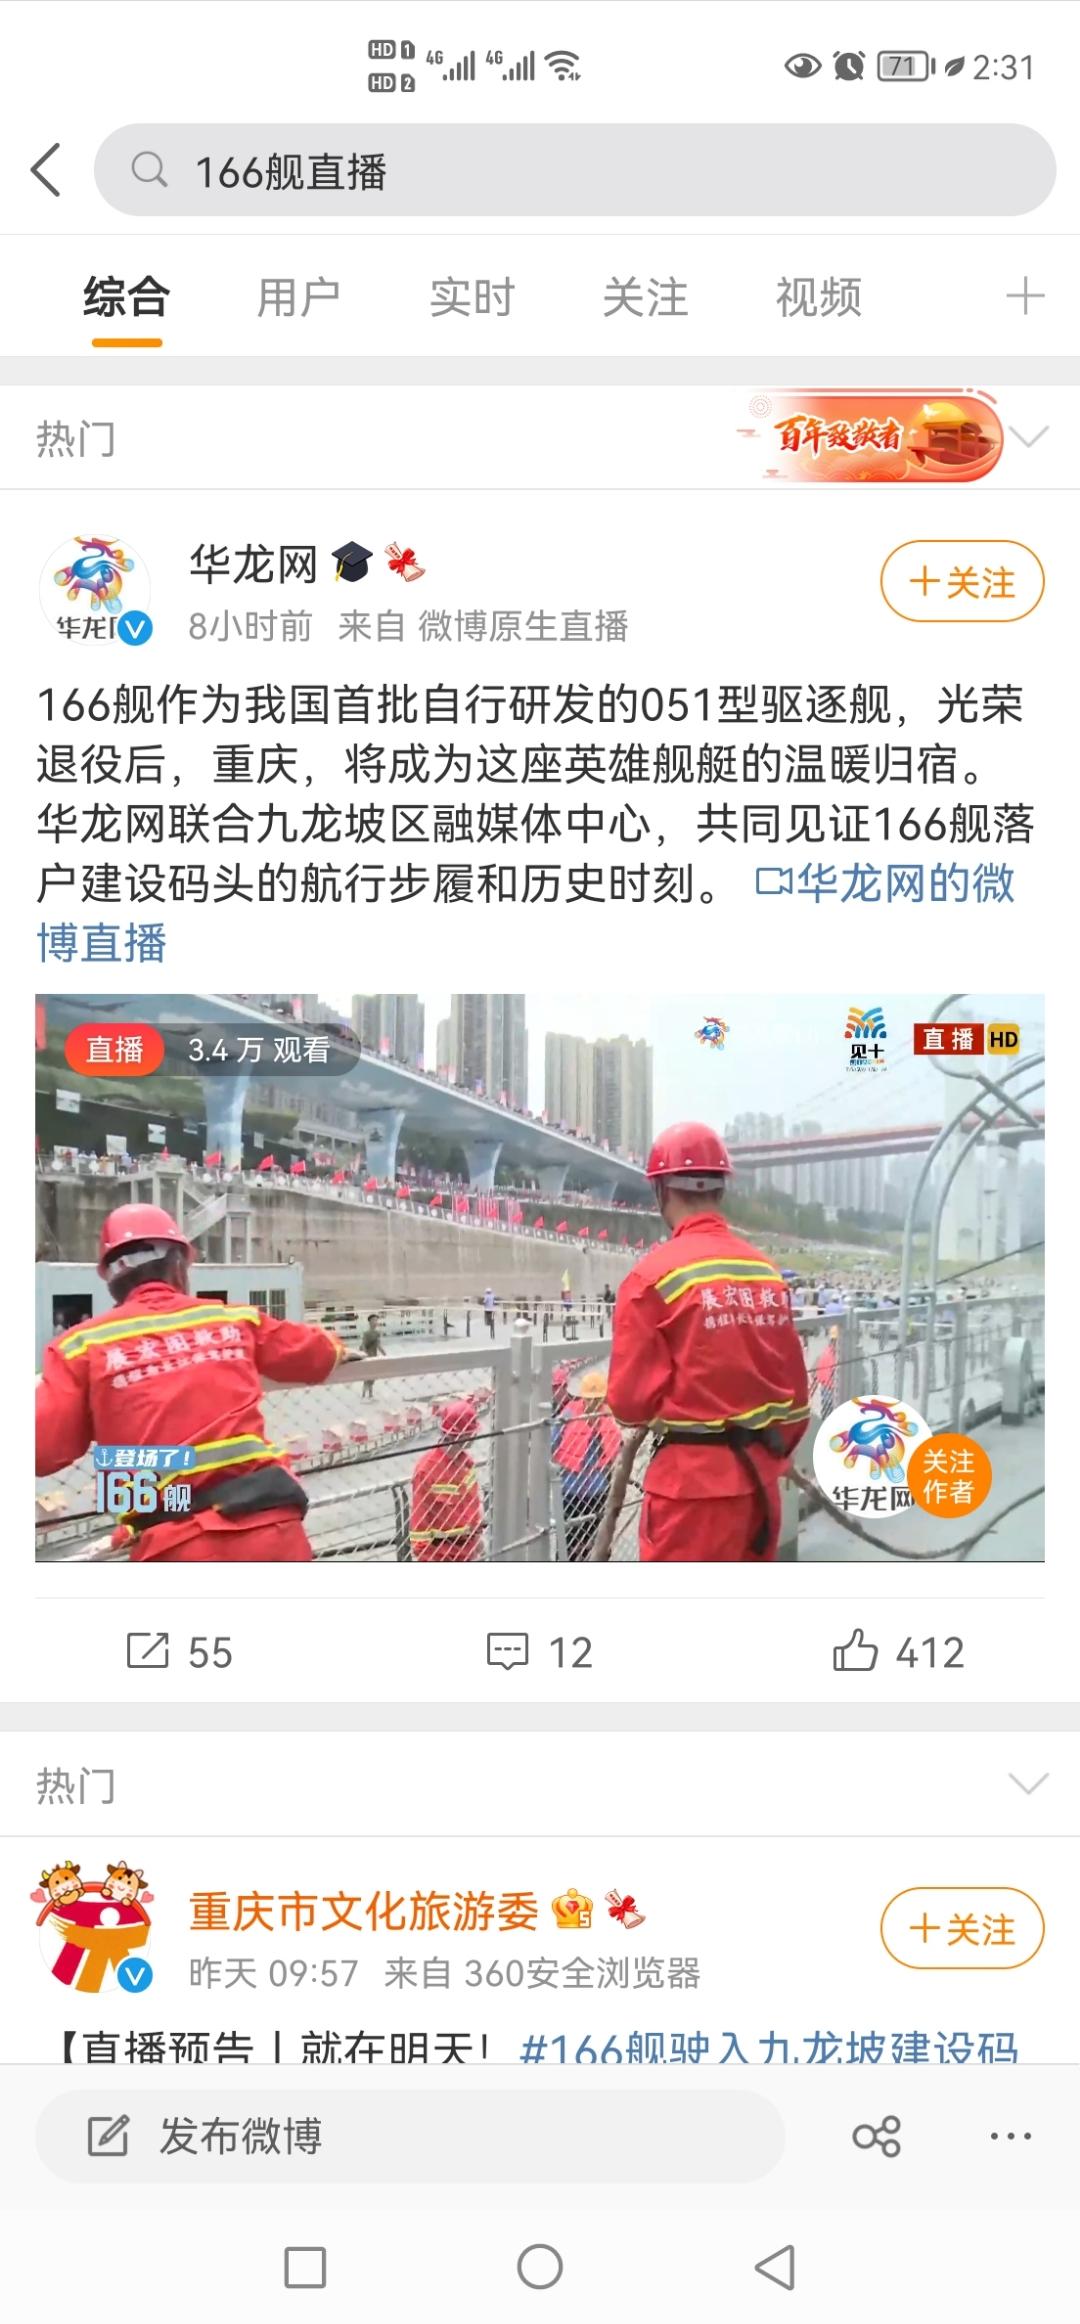 Screenshot_20210626_143101_com.sina.weibo.jpg